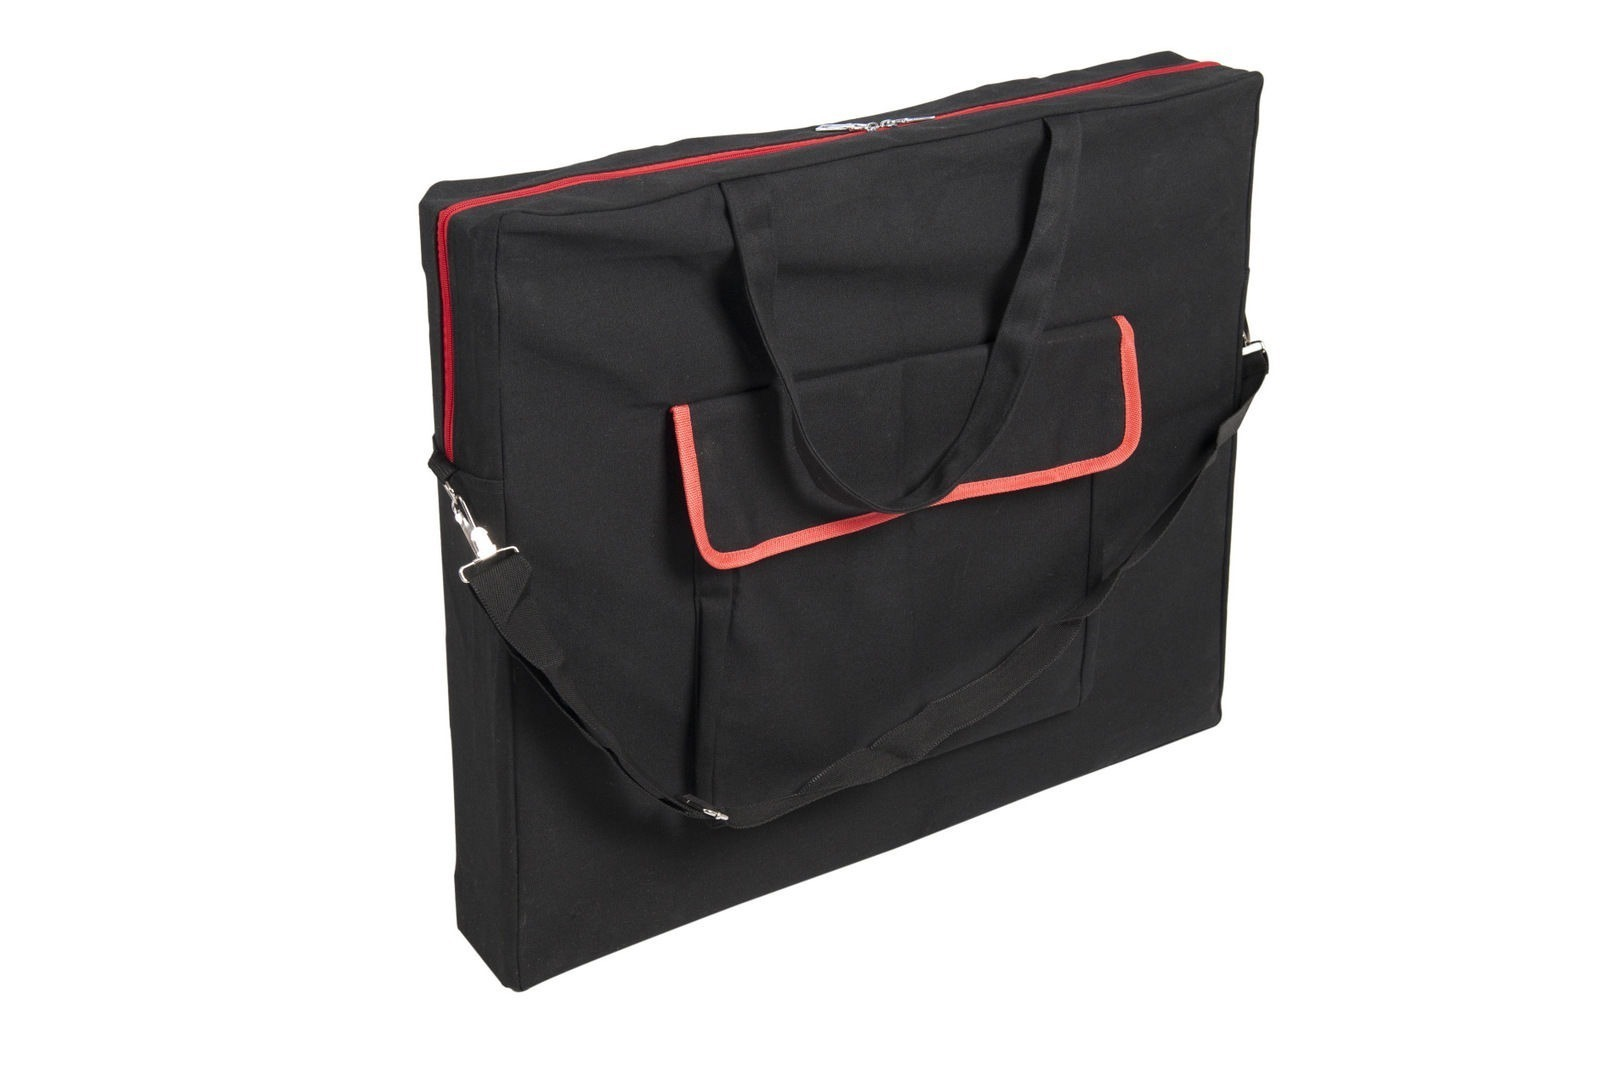 100W Beaut opklapbaar daglichtpaneel set in koffer 12 Volt-2750